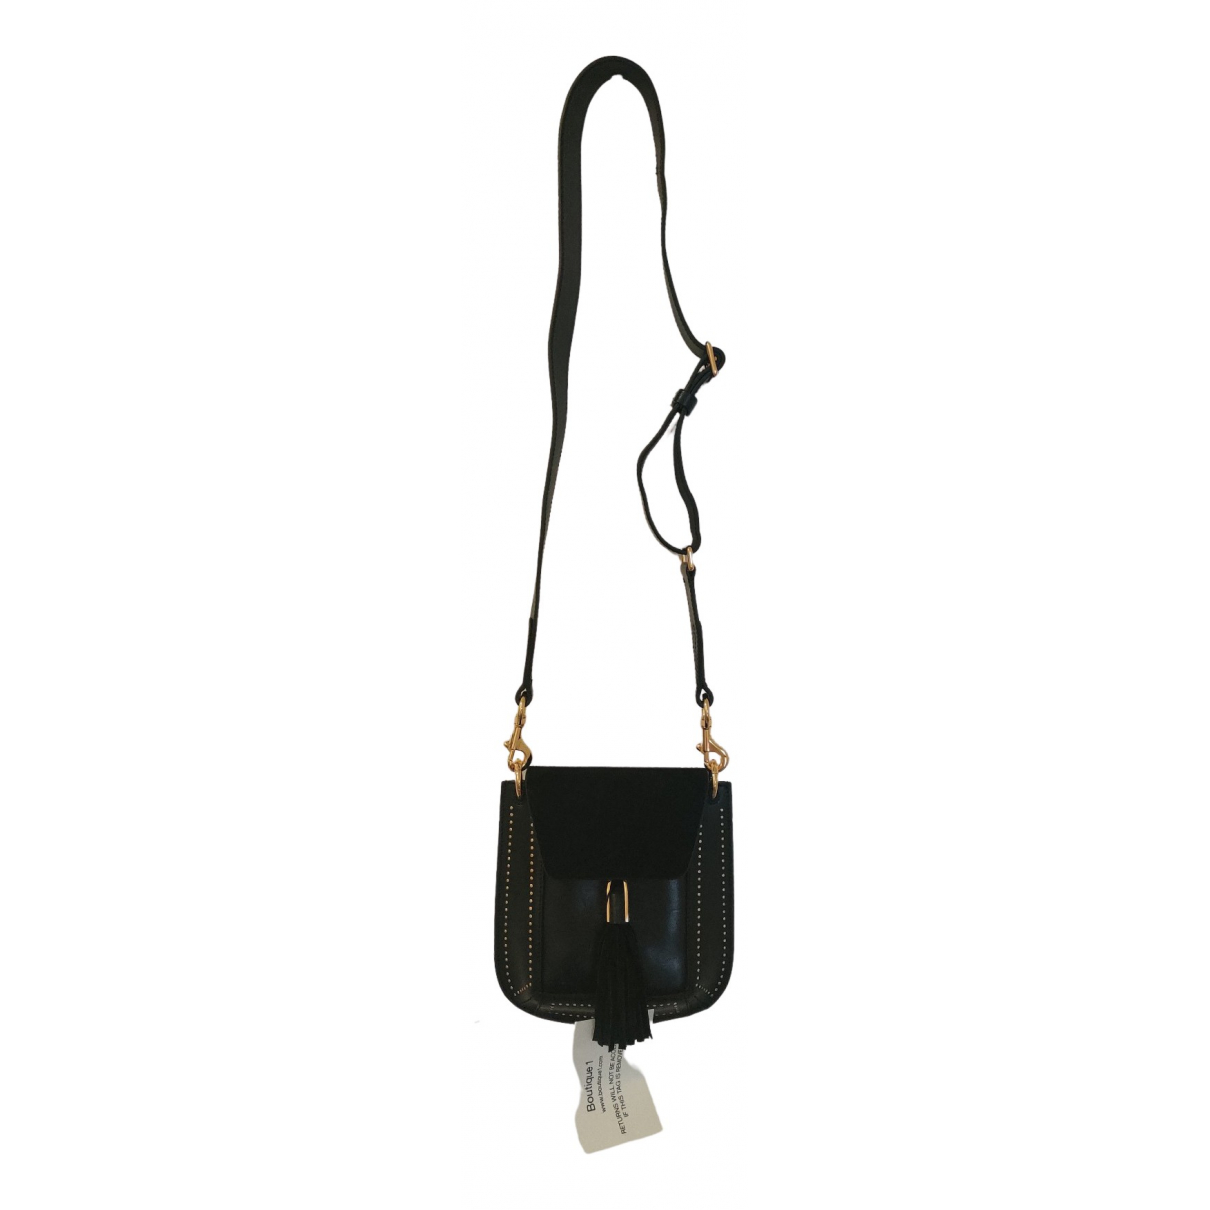 Isabel Marant N Black Leather handbag for Women N